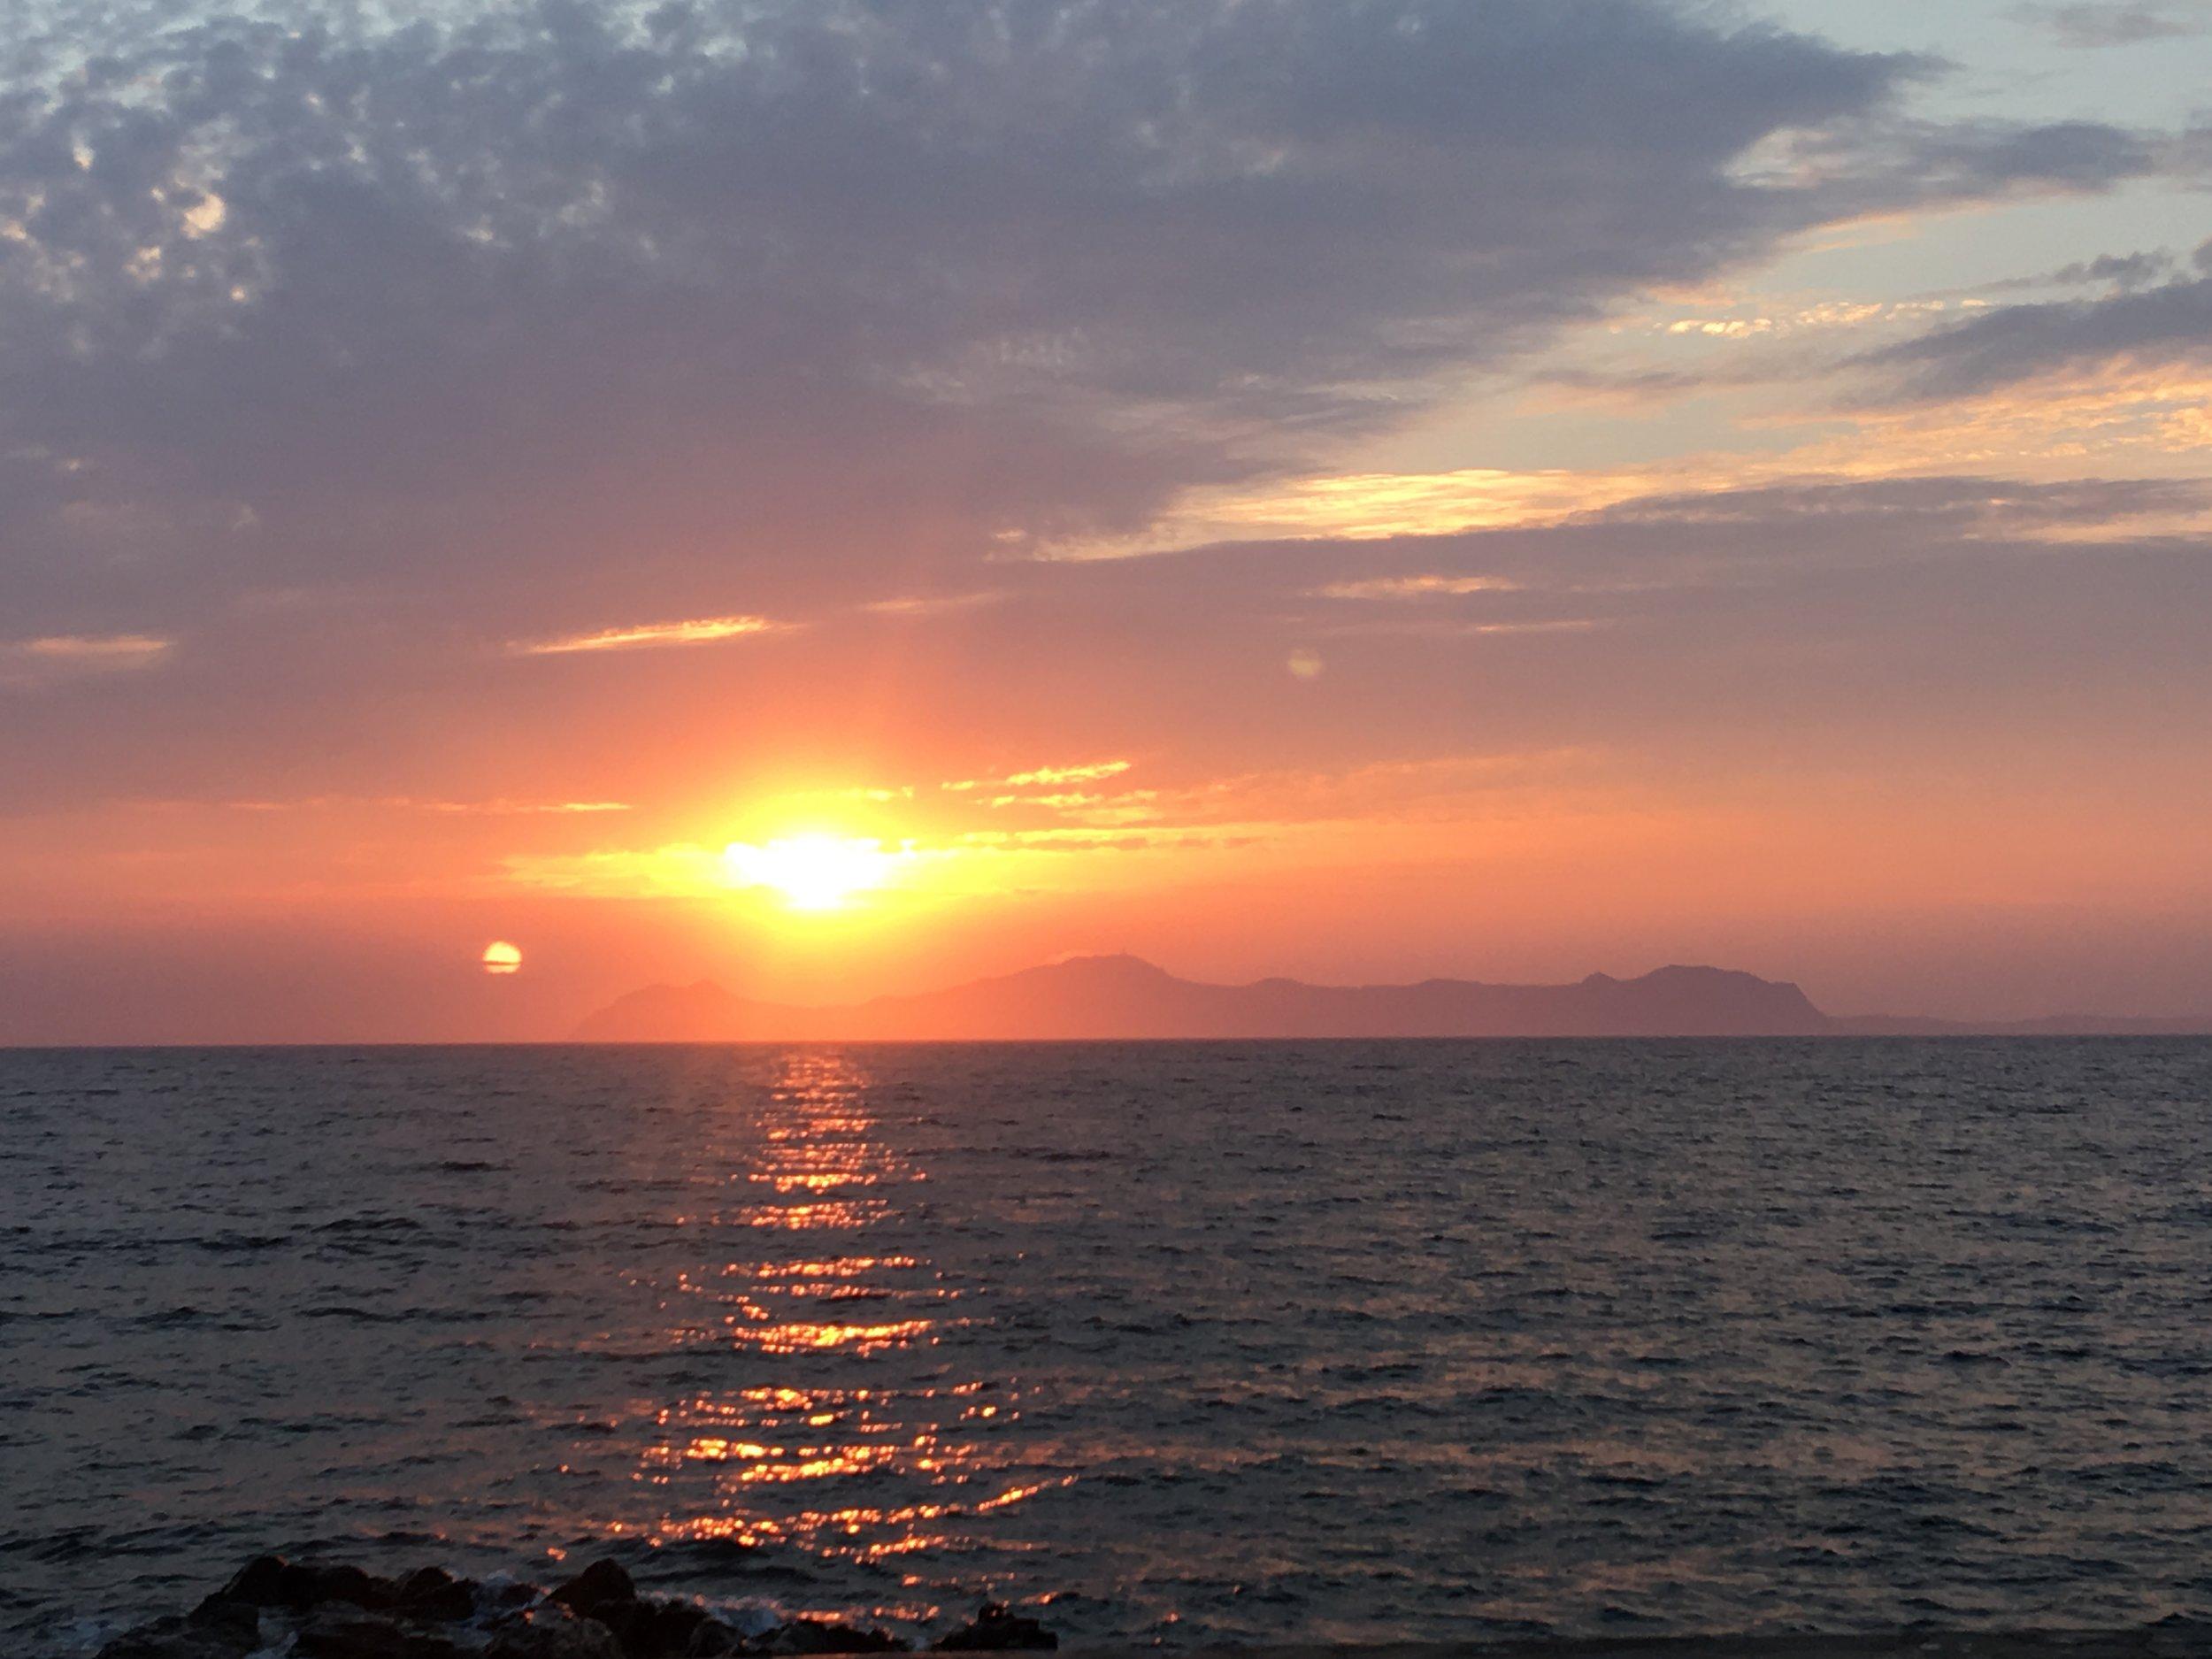 A MedSea Early Morning Sail